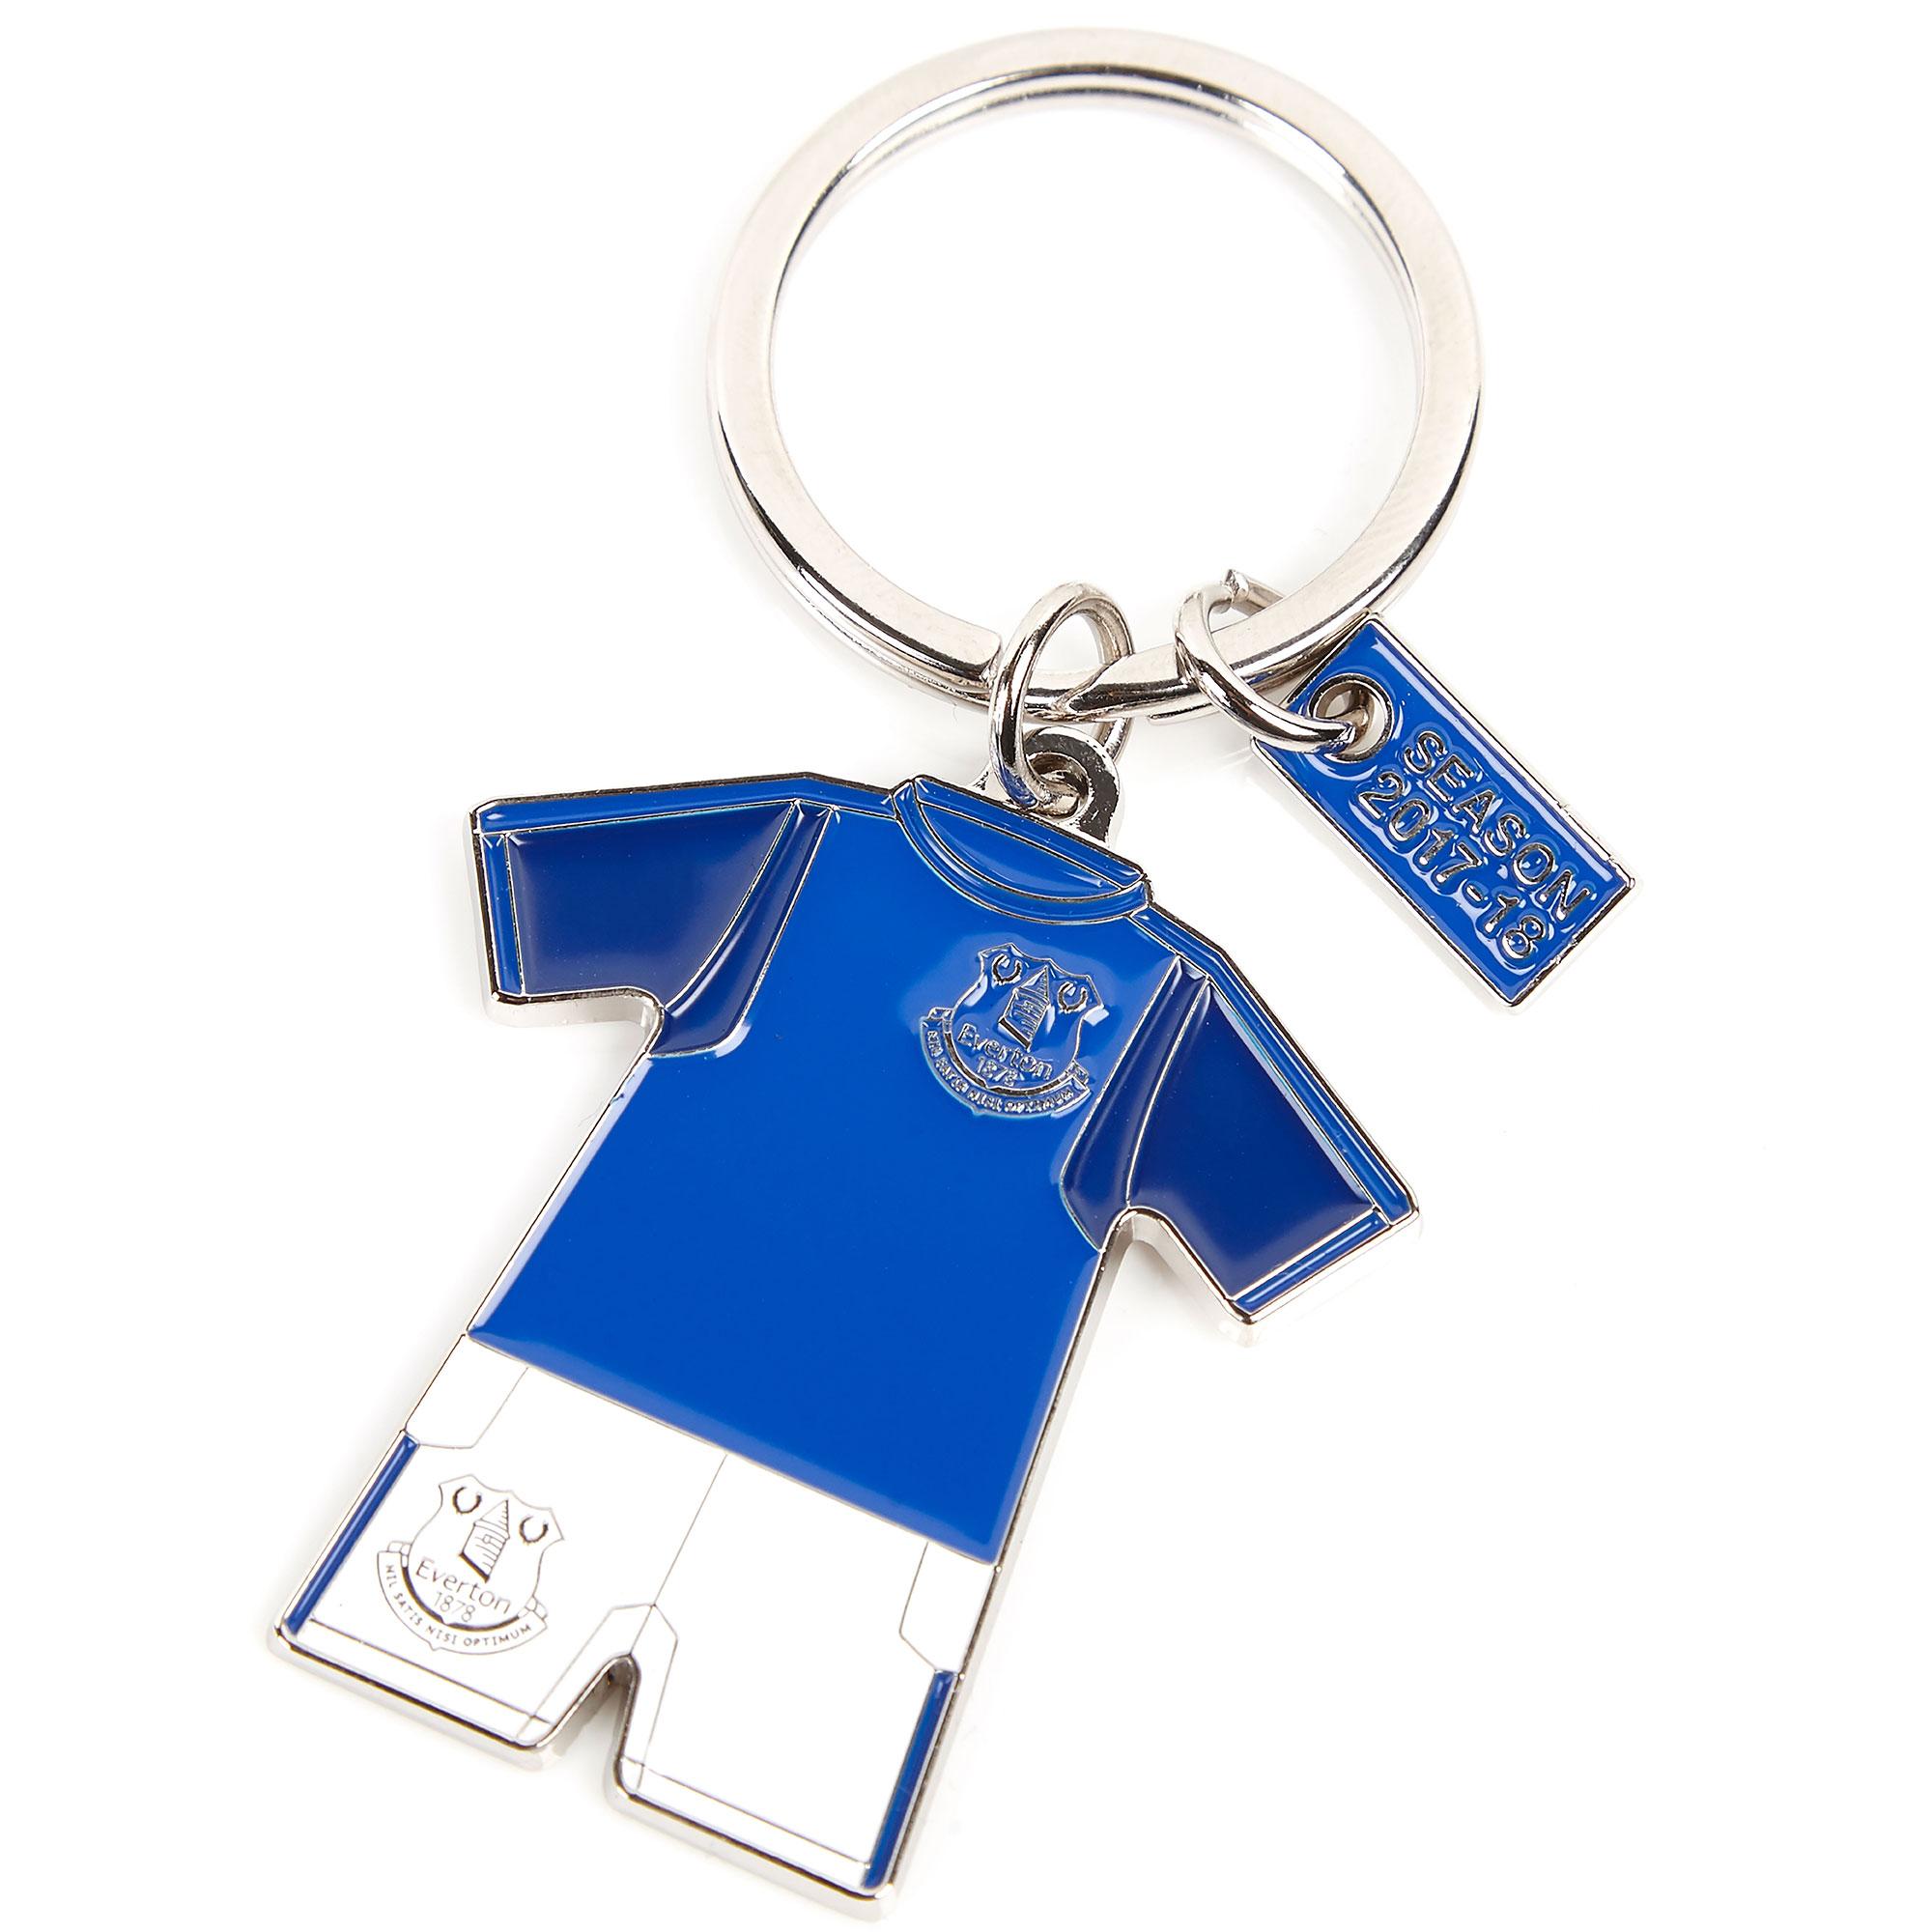 Everton Home Kit Keyring 2017/18